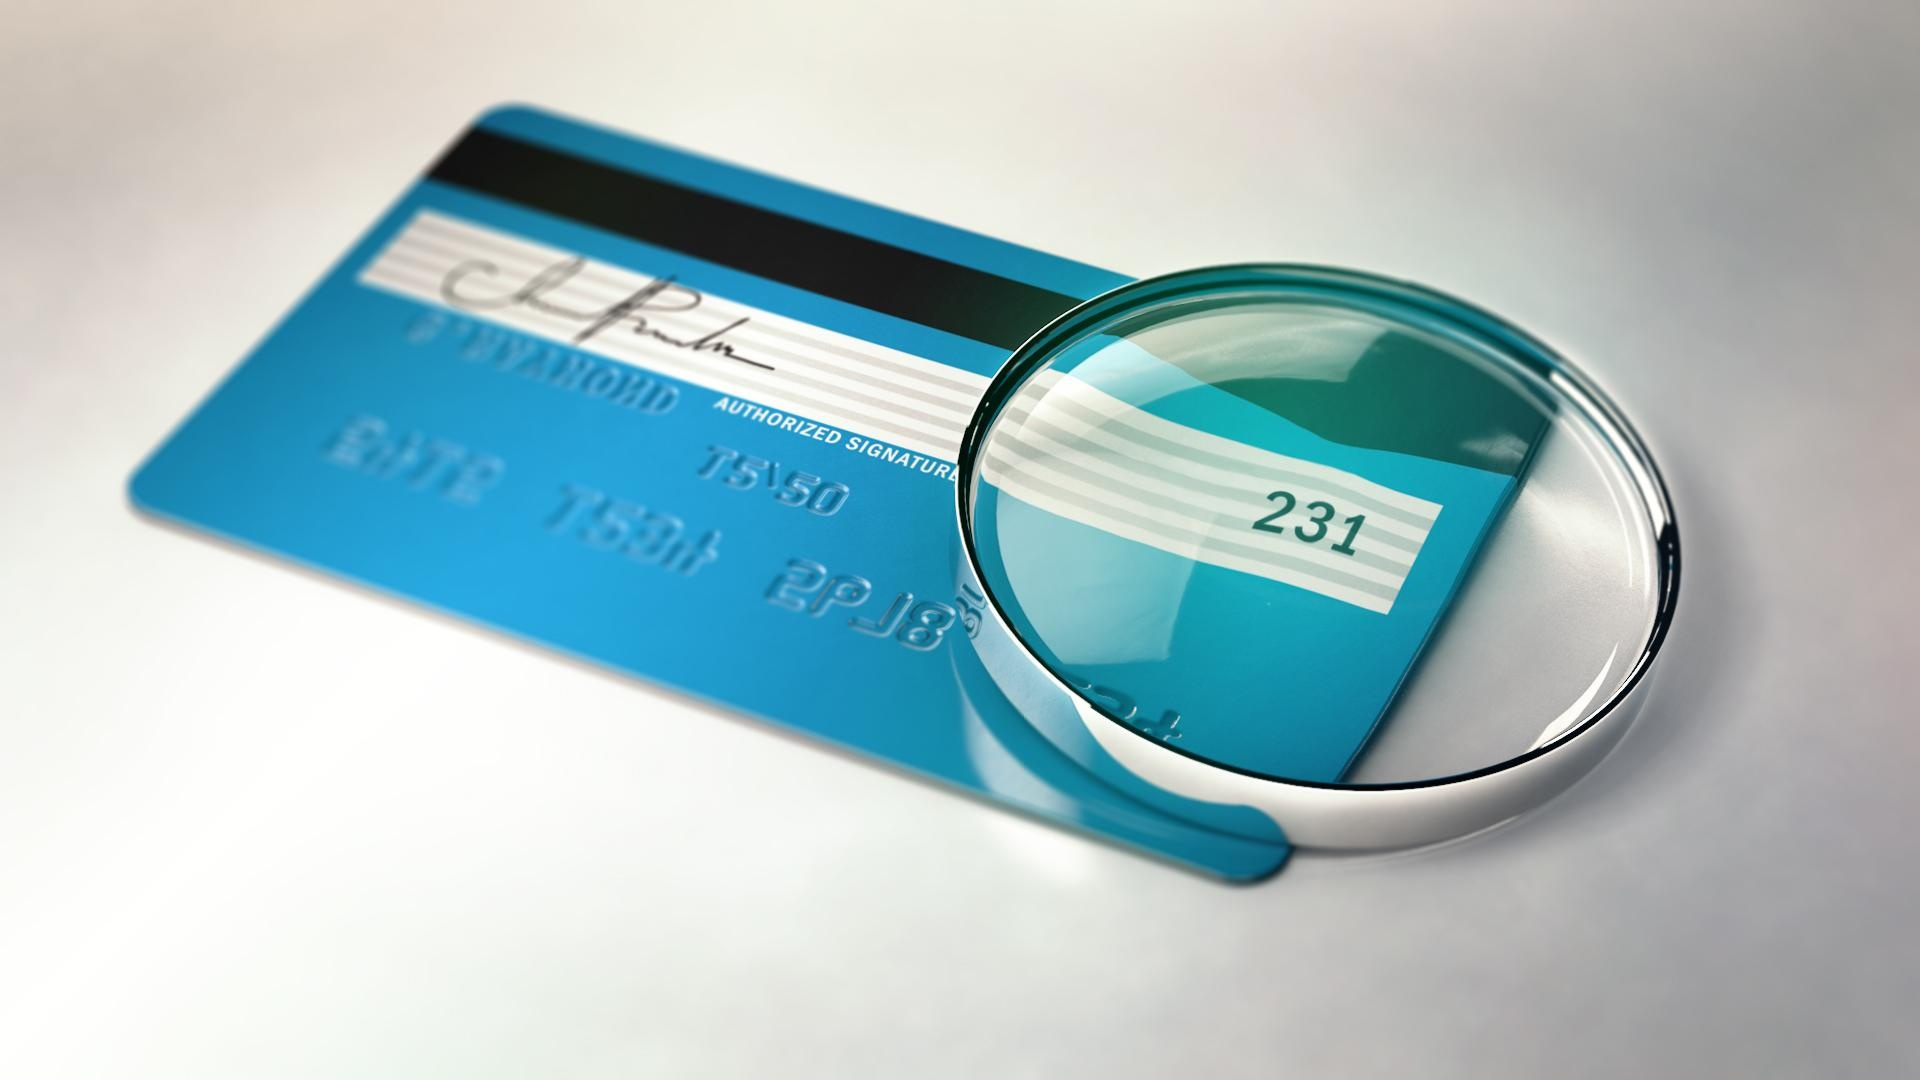 Choosing a credit card company made easy